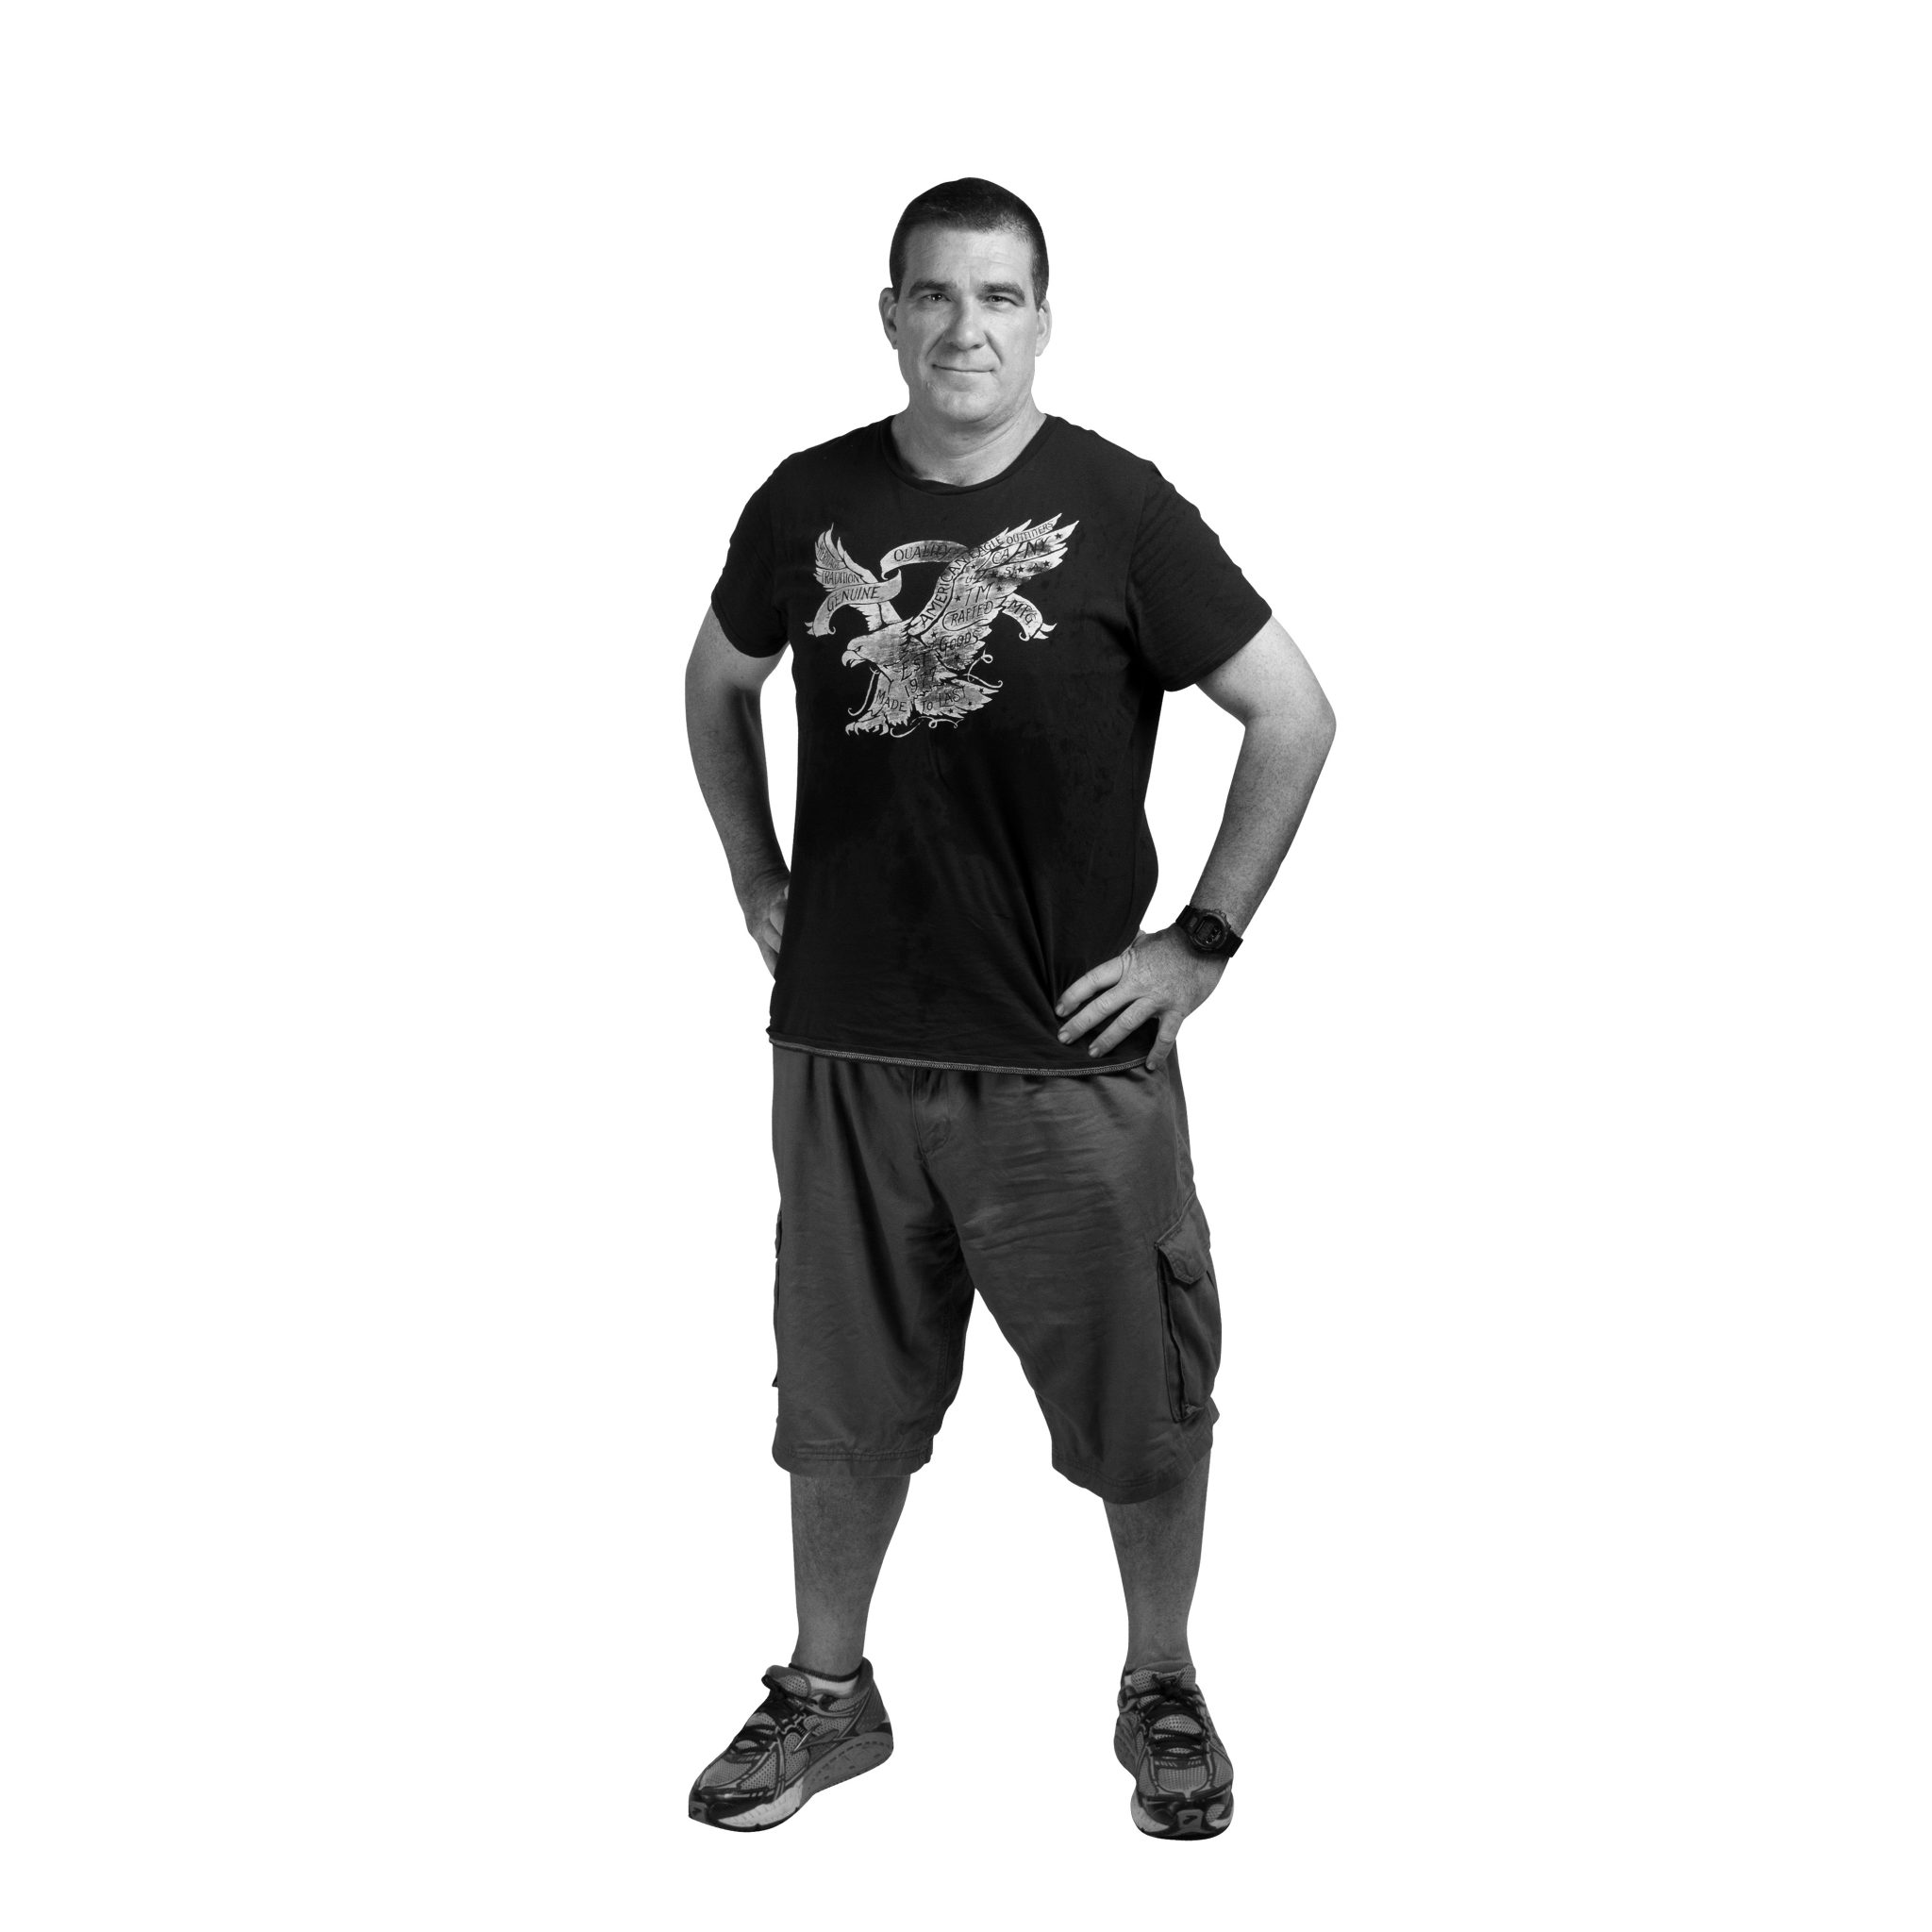 The Man Challenge: How Trav lost 28 kilograms